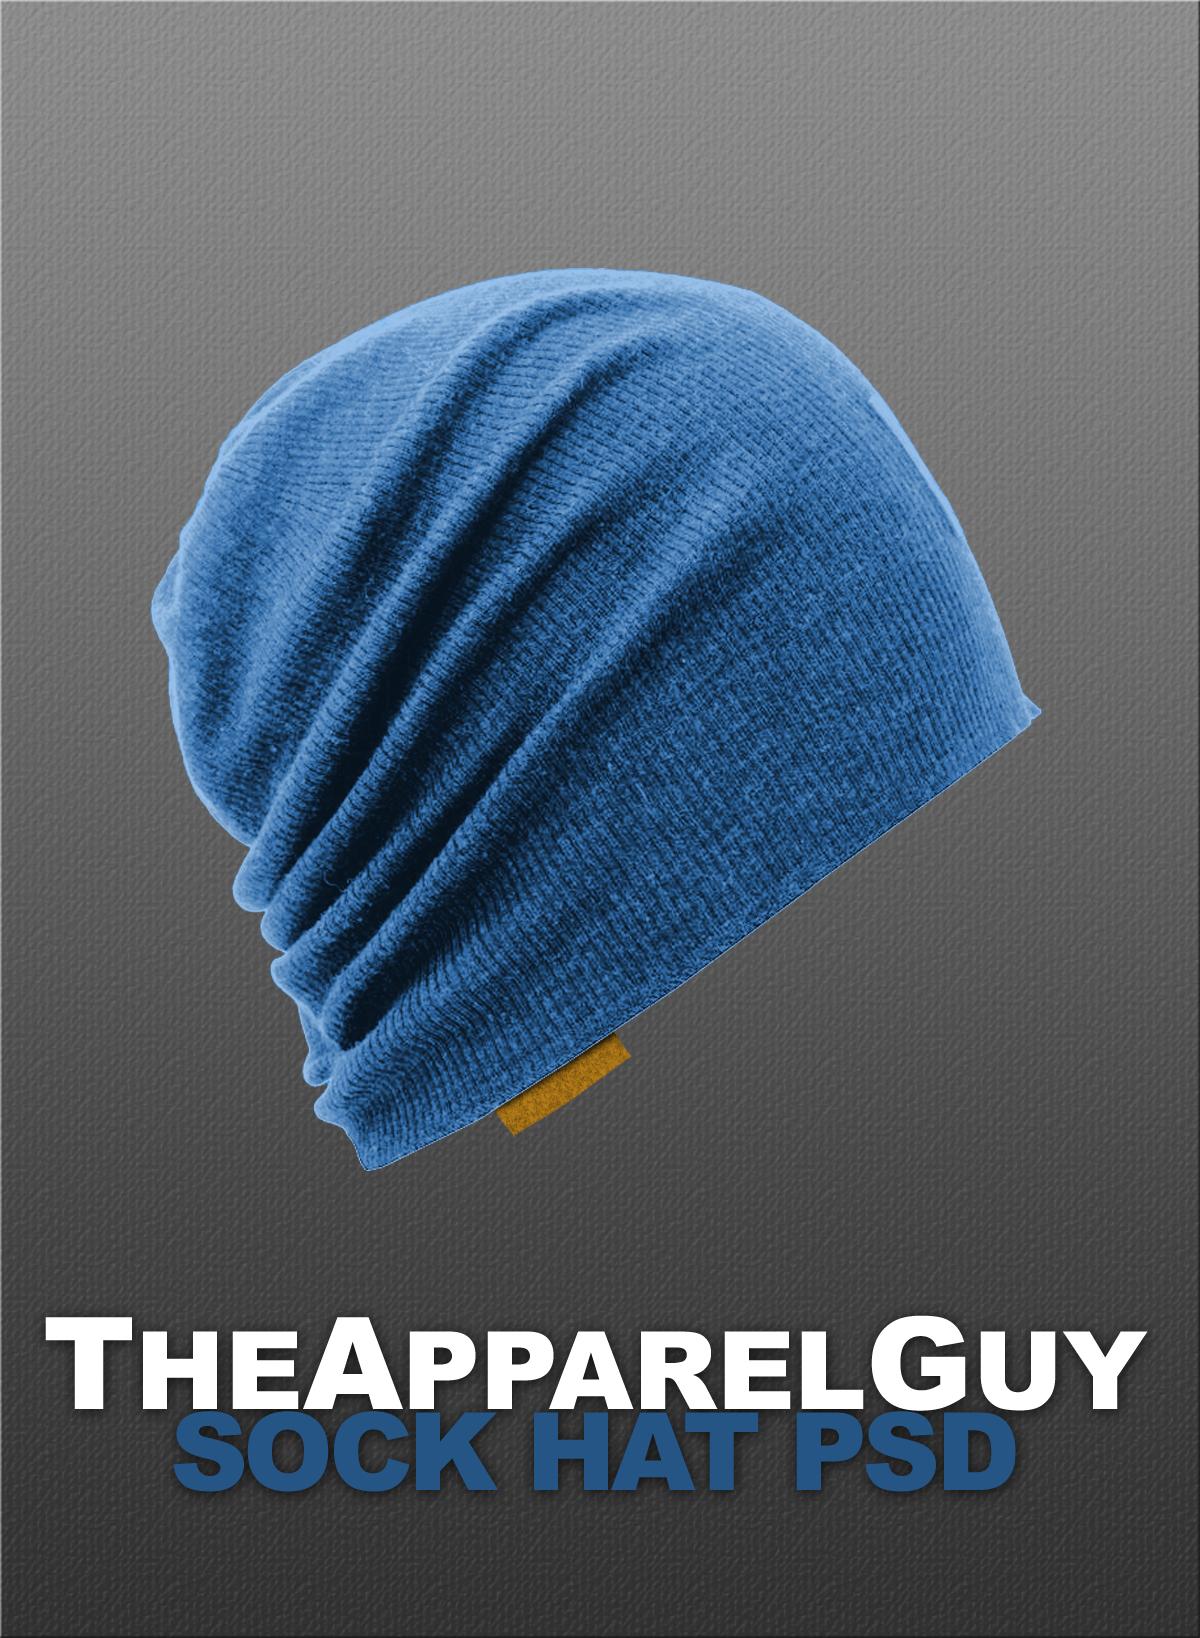 Sock Hat PSD